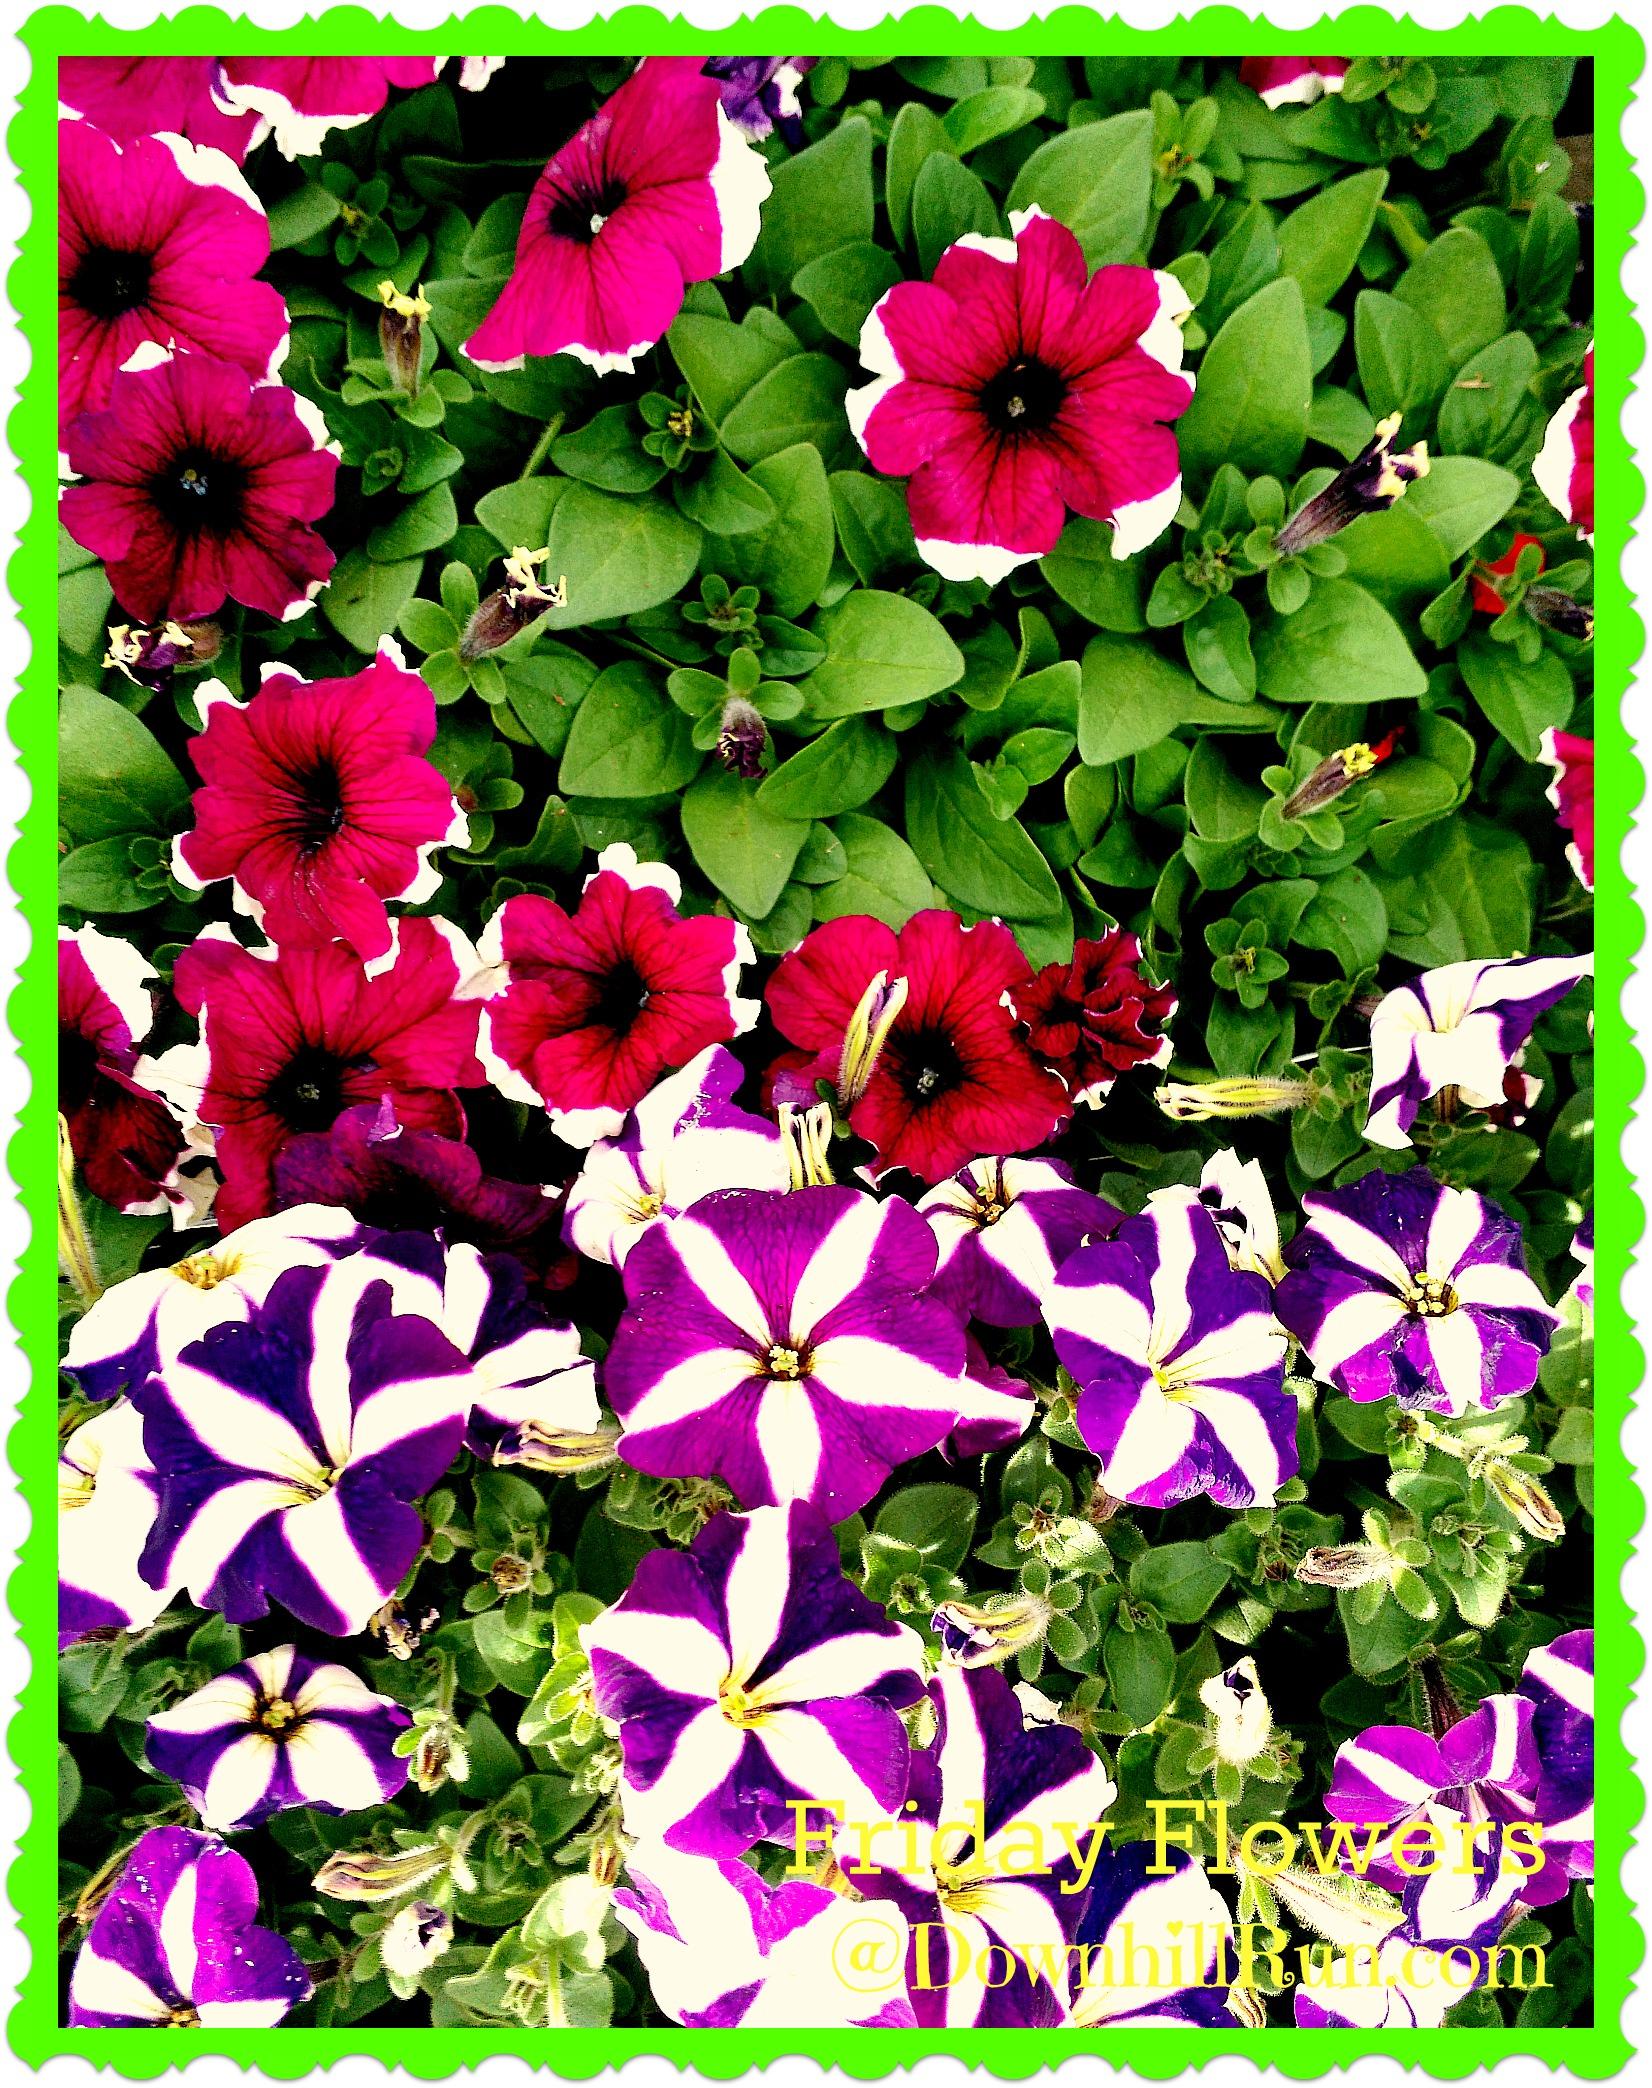 Friday Flowers Simplestepsforlivinglife